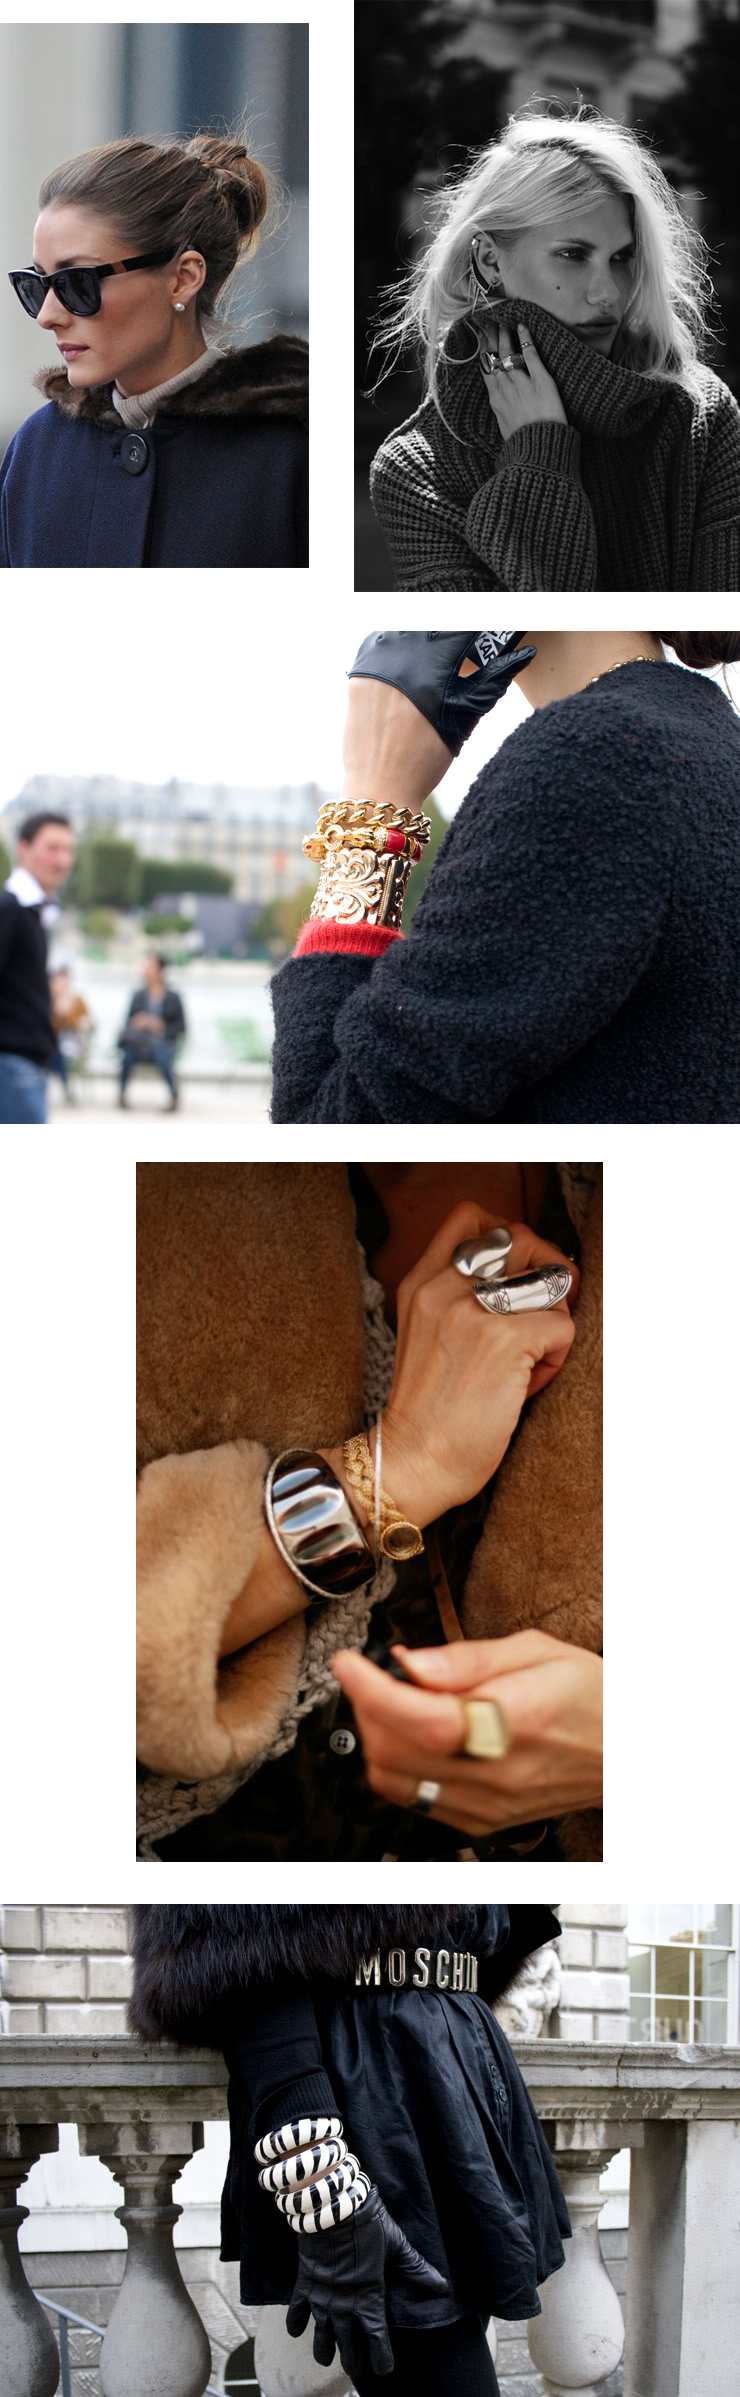 in detail - winter jewels